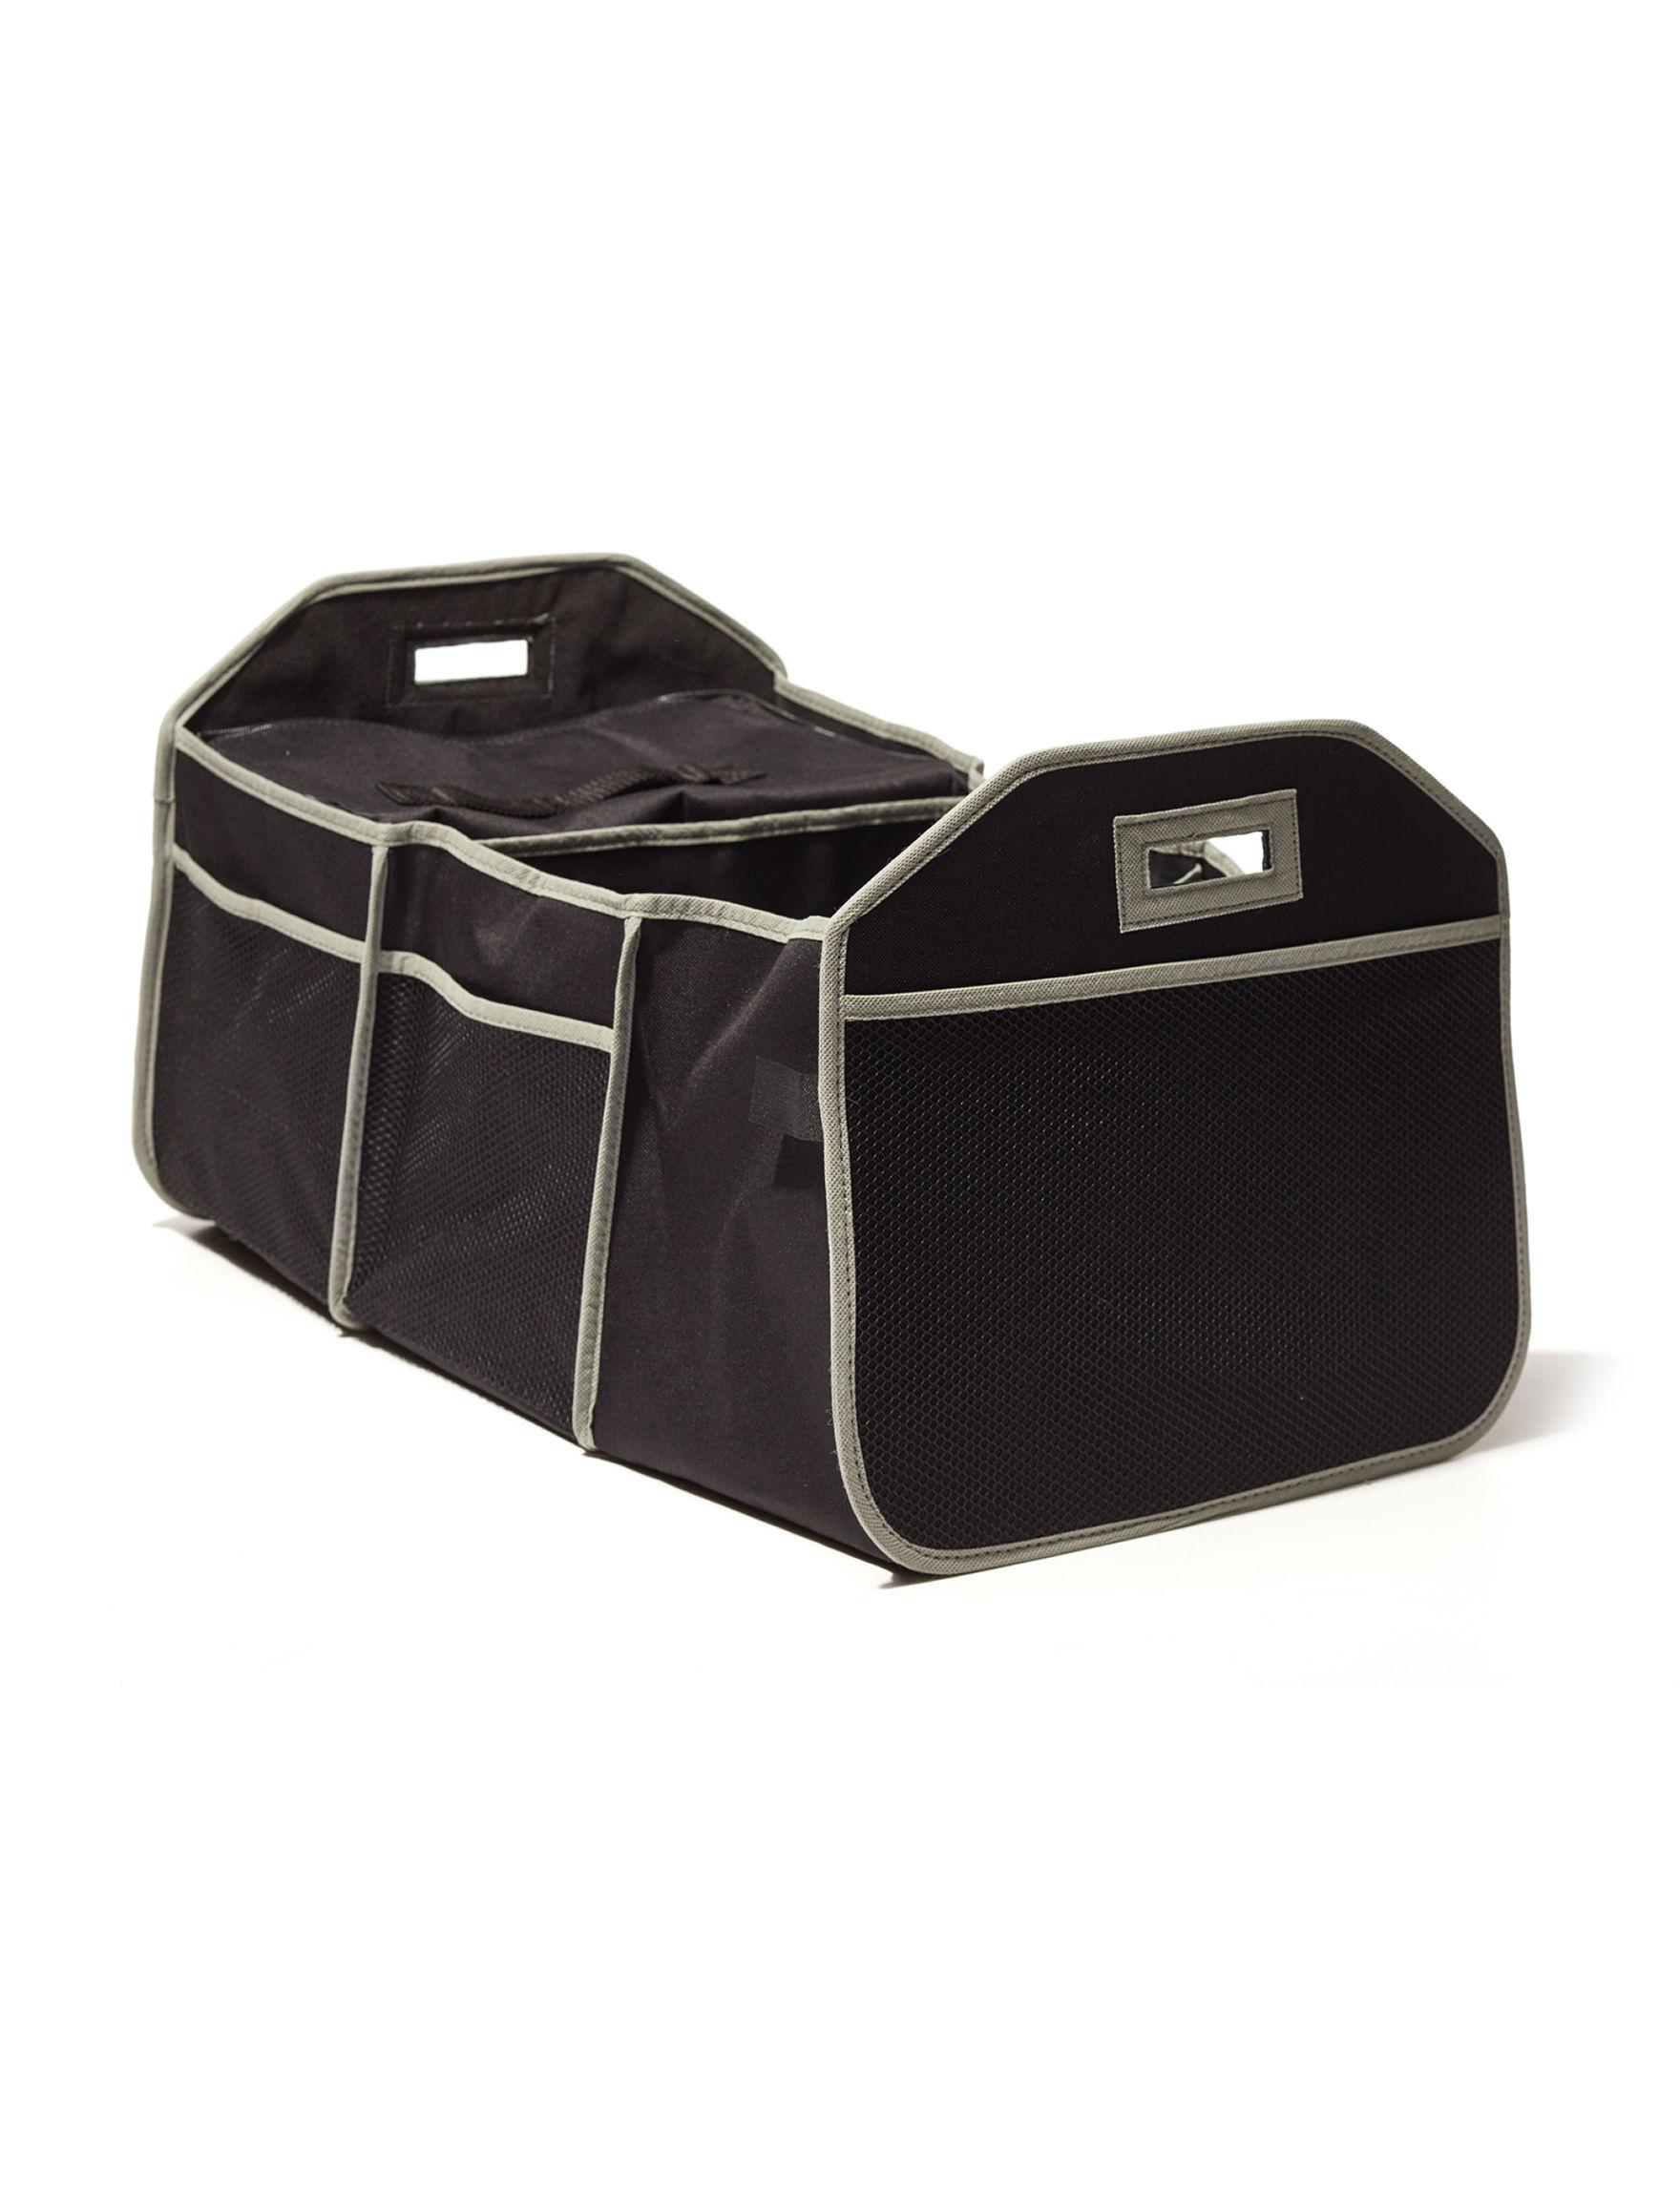 Home Basics Black / Grey Storage & Organization